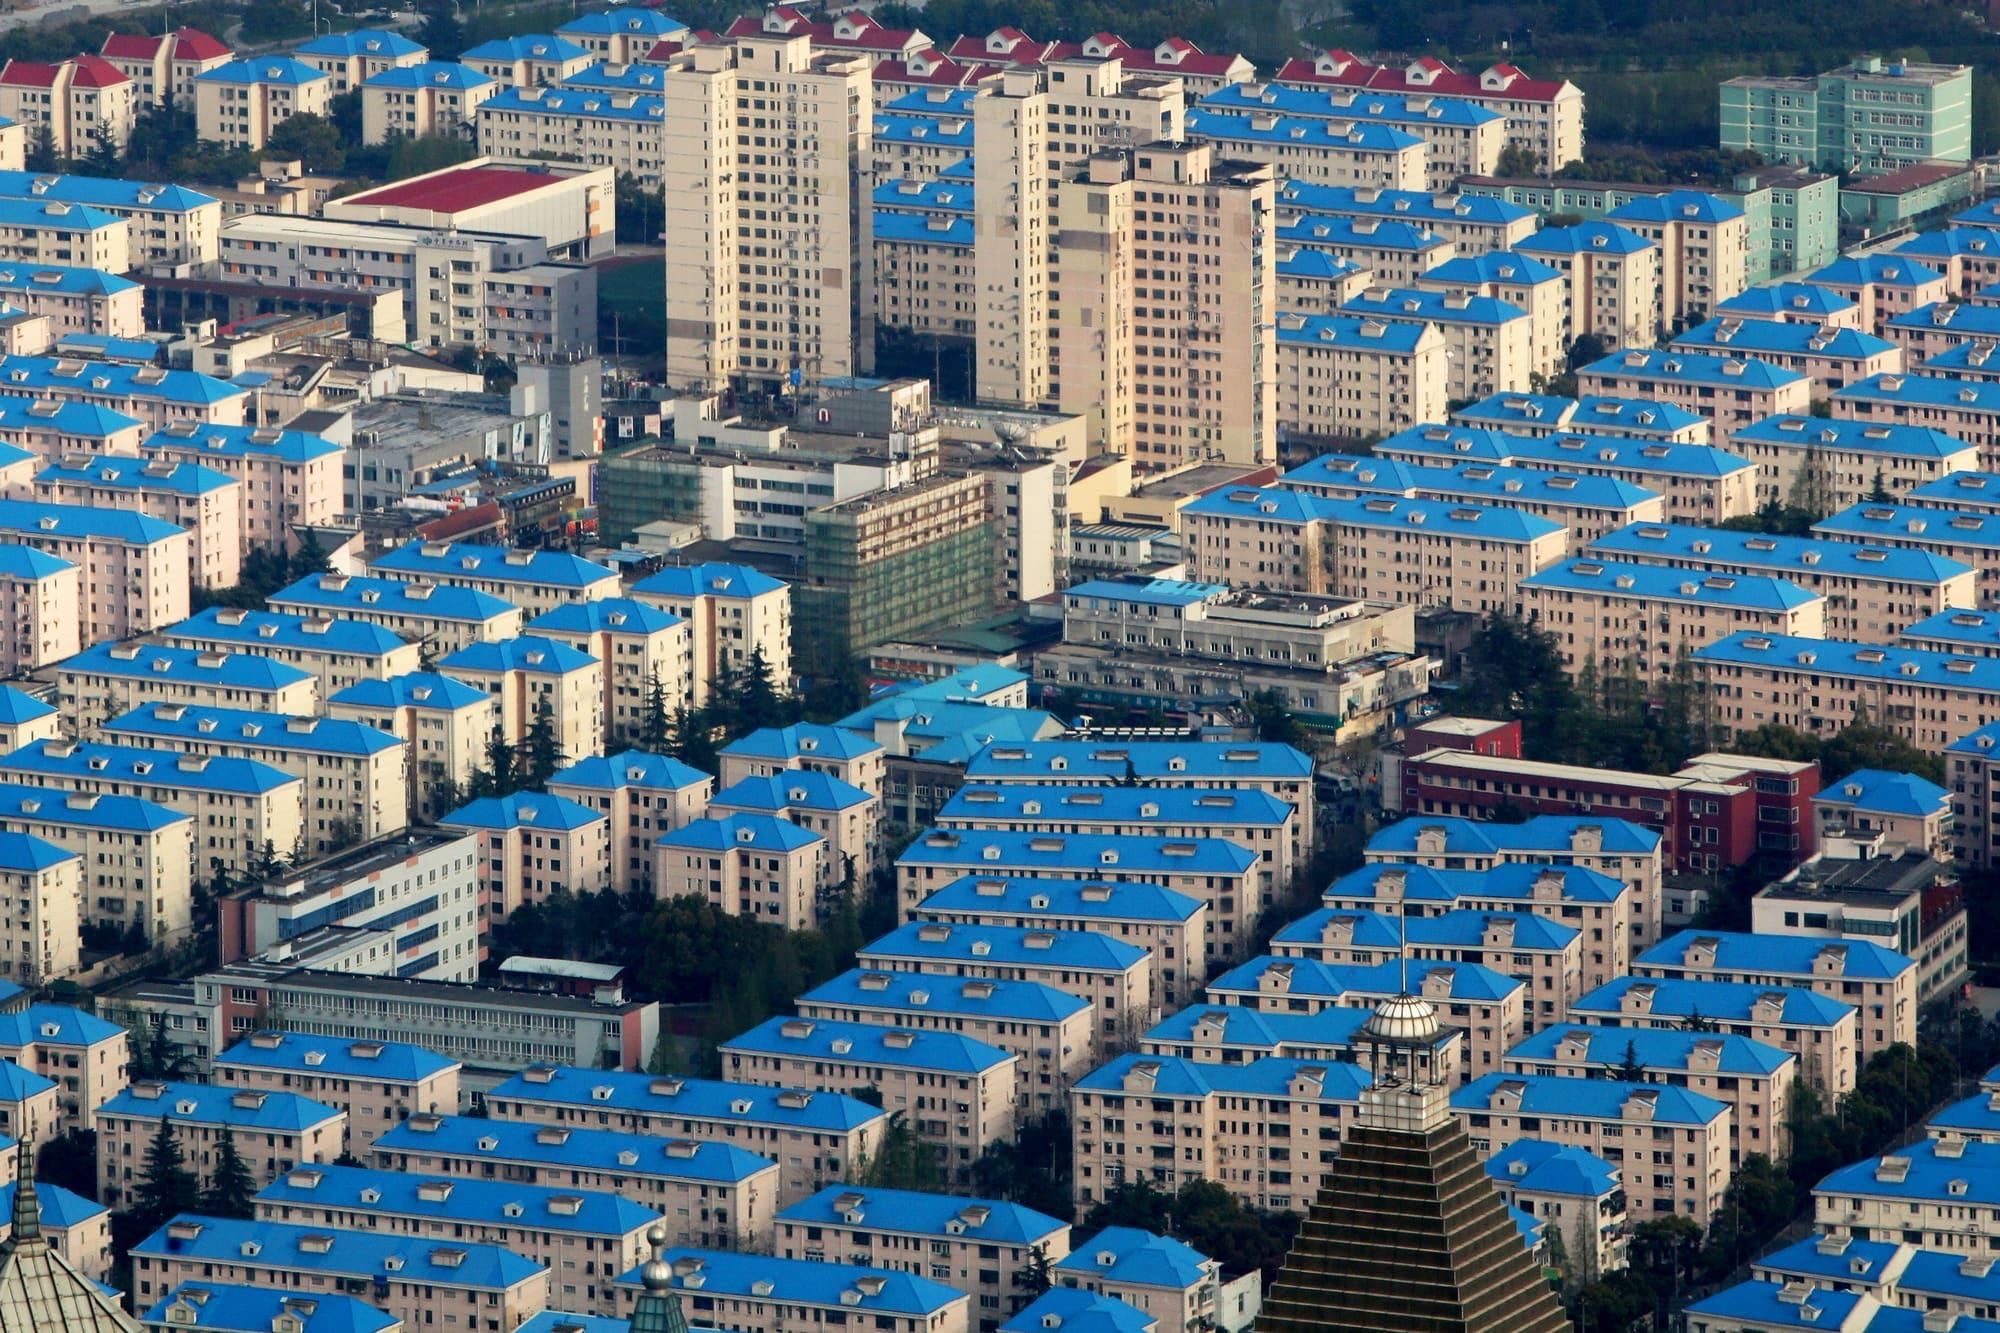 Cityscape of Shanghai, China.